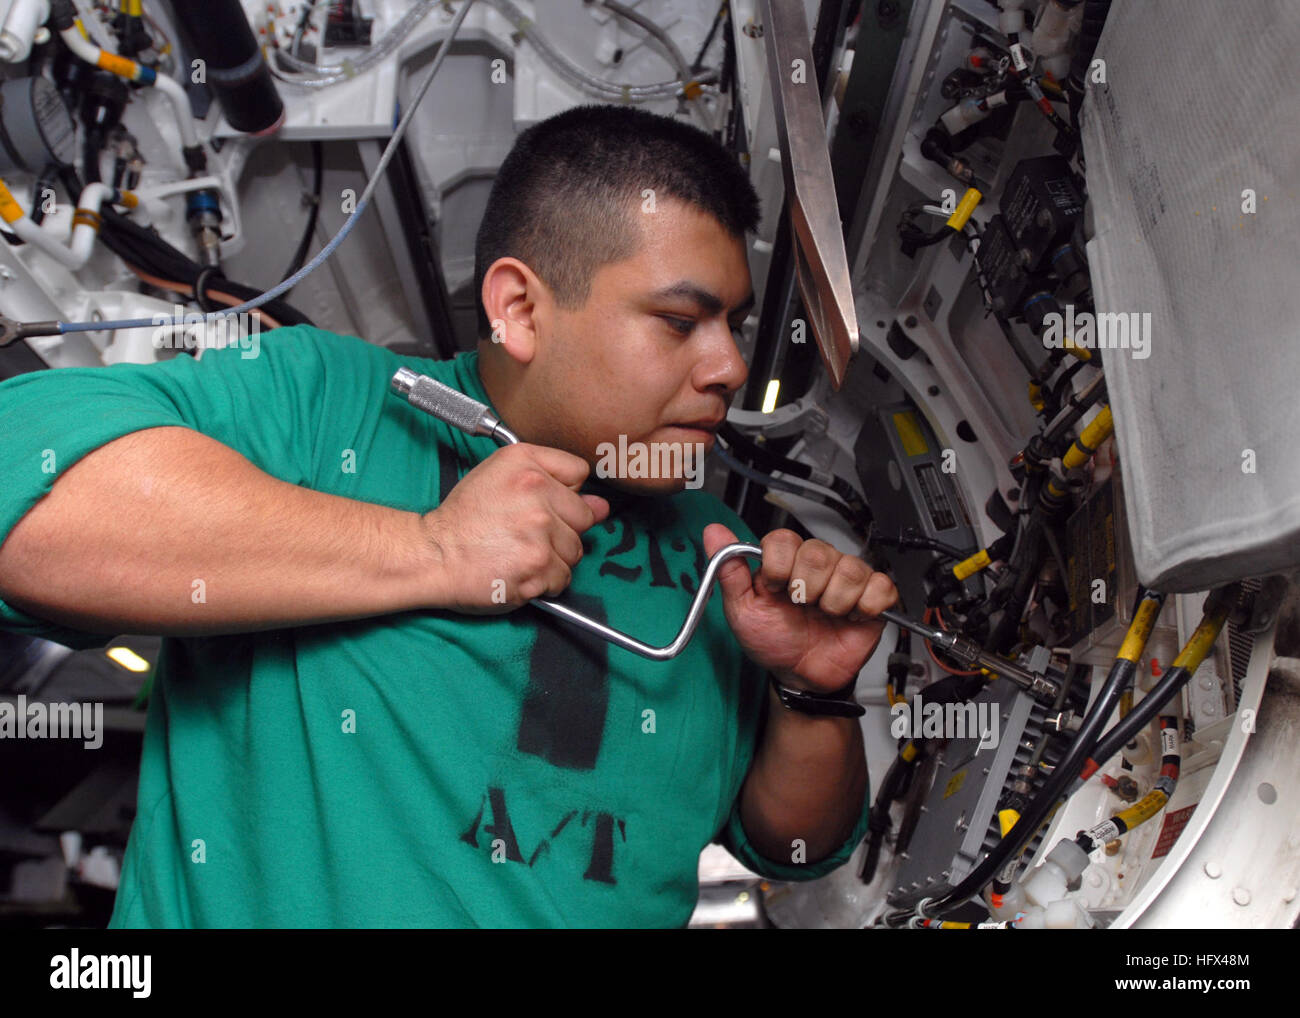 090113-N-2456S-006 GULF OF OMAN (Jan. 13, 2009) Aviation Electronics Technician Airman William Vasquez, assigned - Stock Image